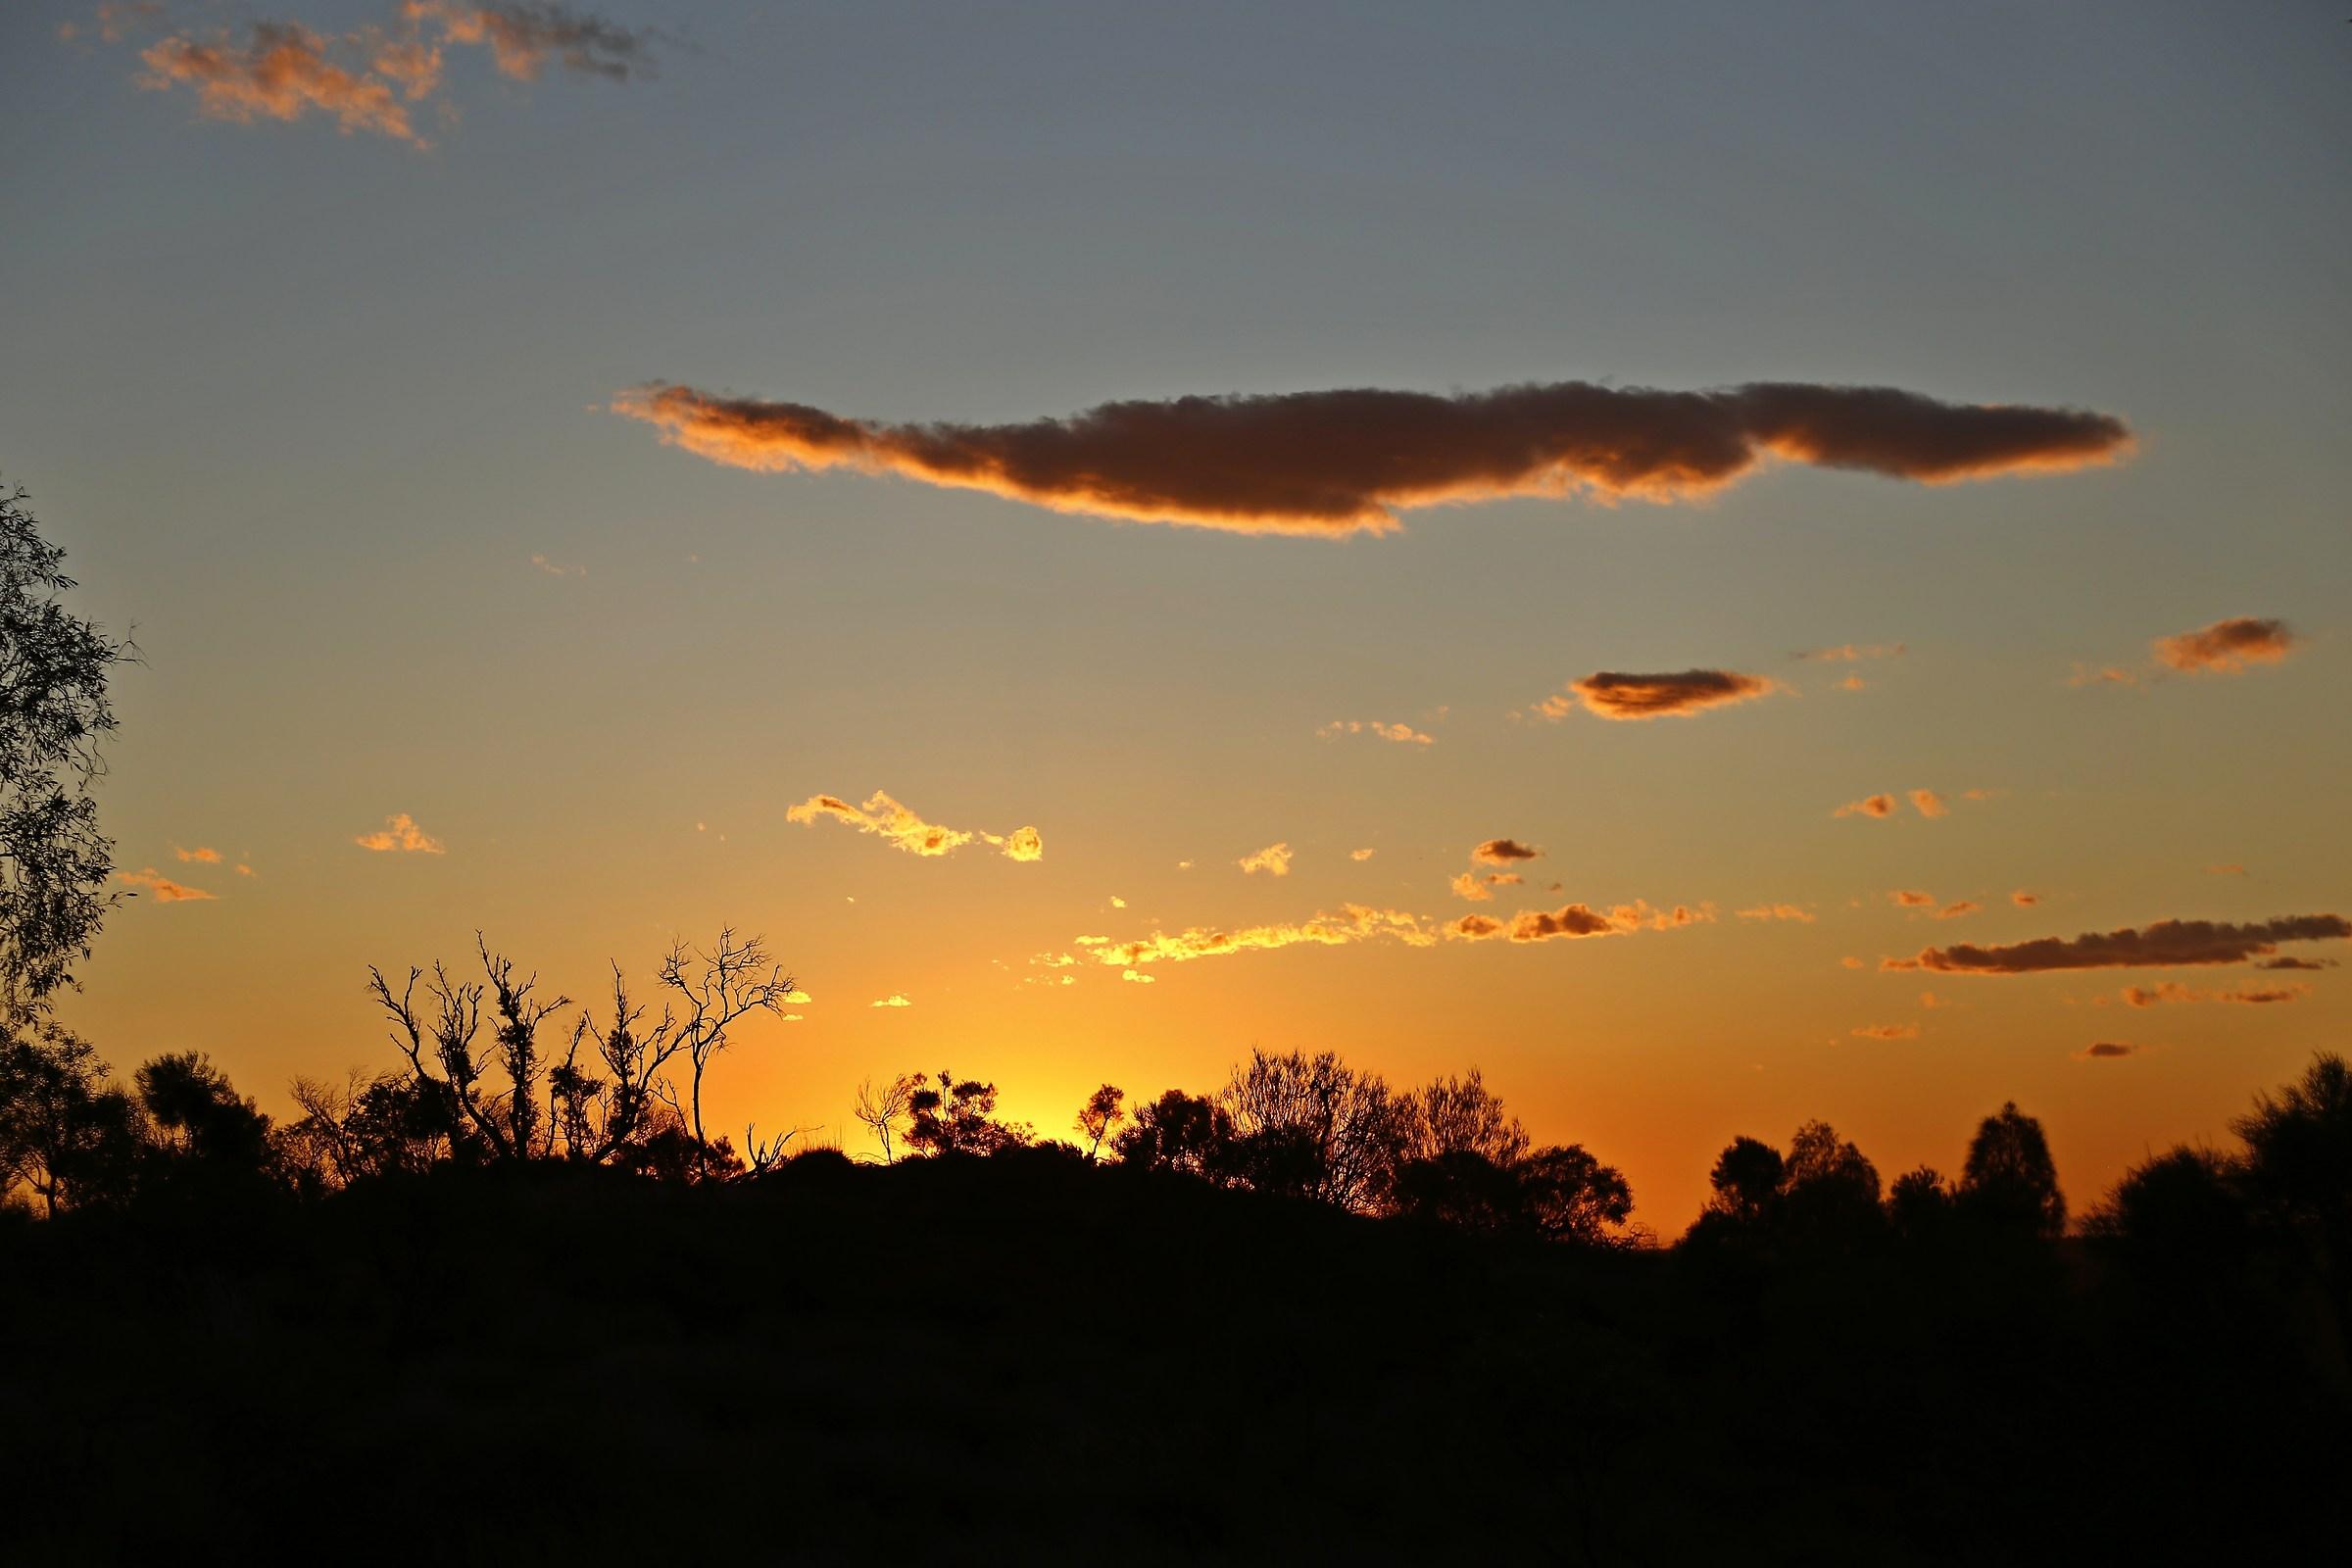 A dreamy sunset ......